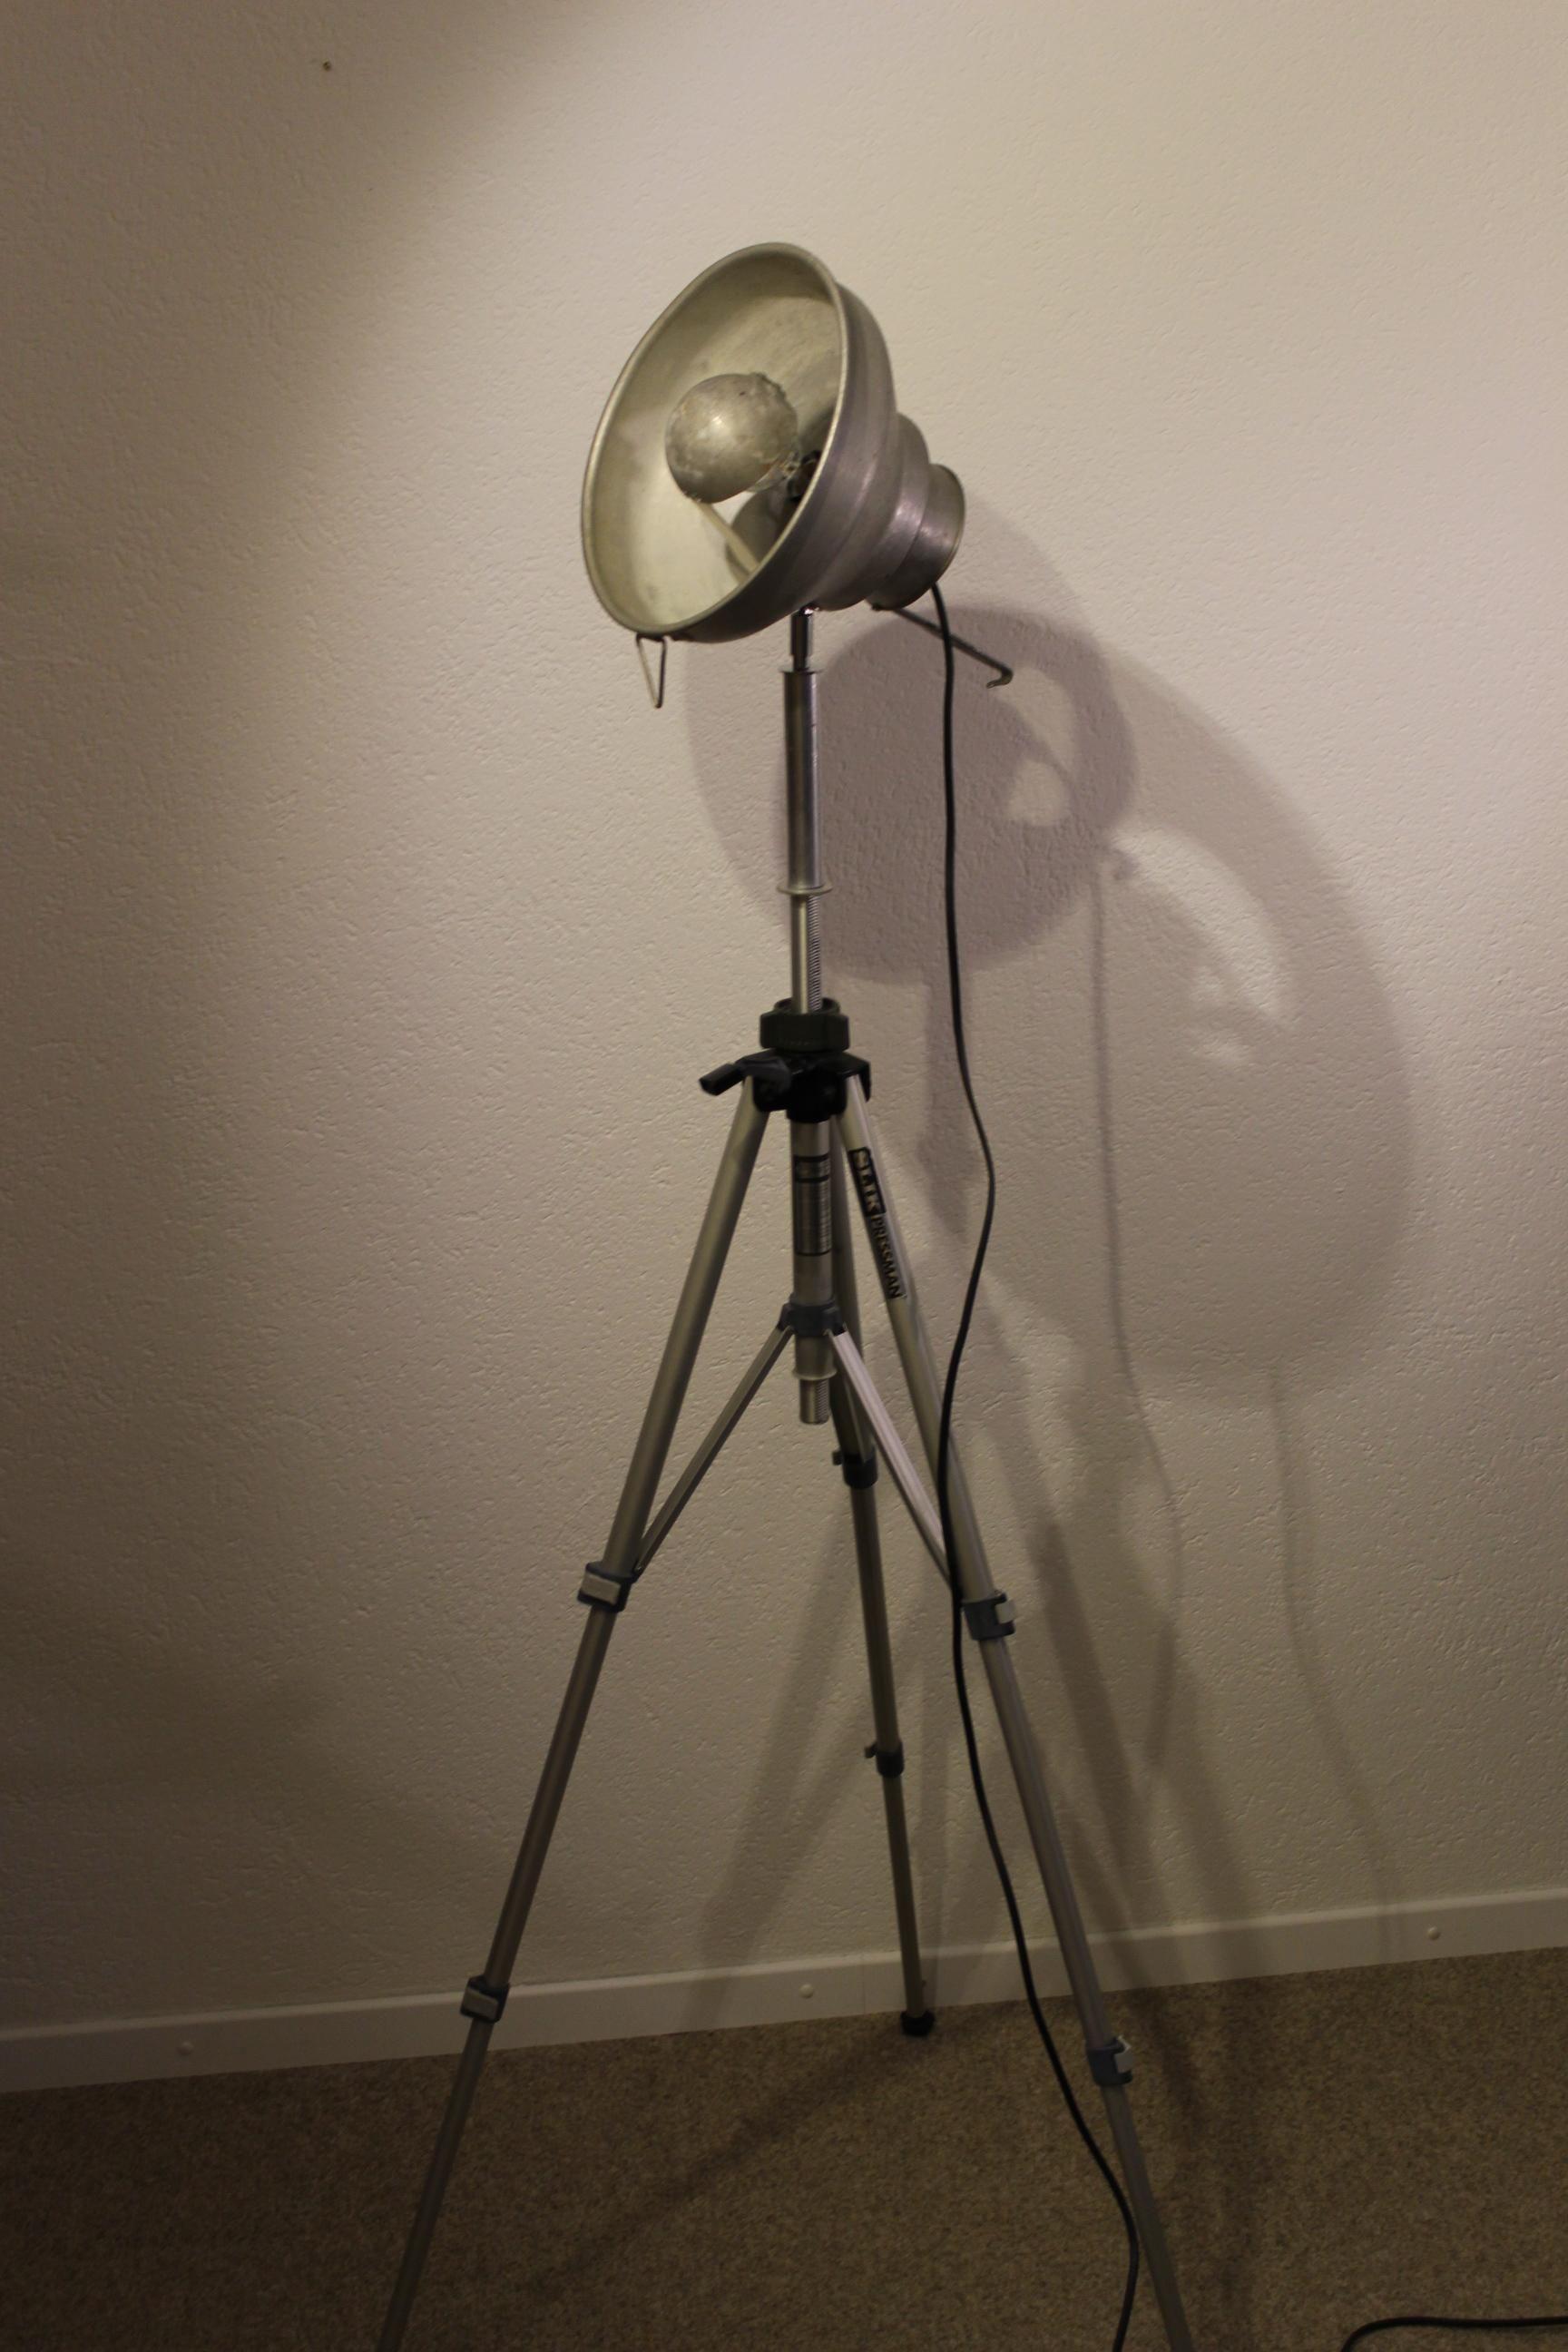 upcycling lampen und leuchten selber machen. lampenbau more cool